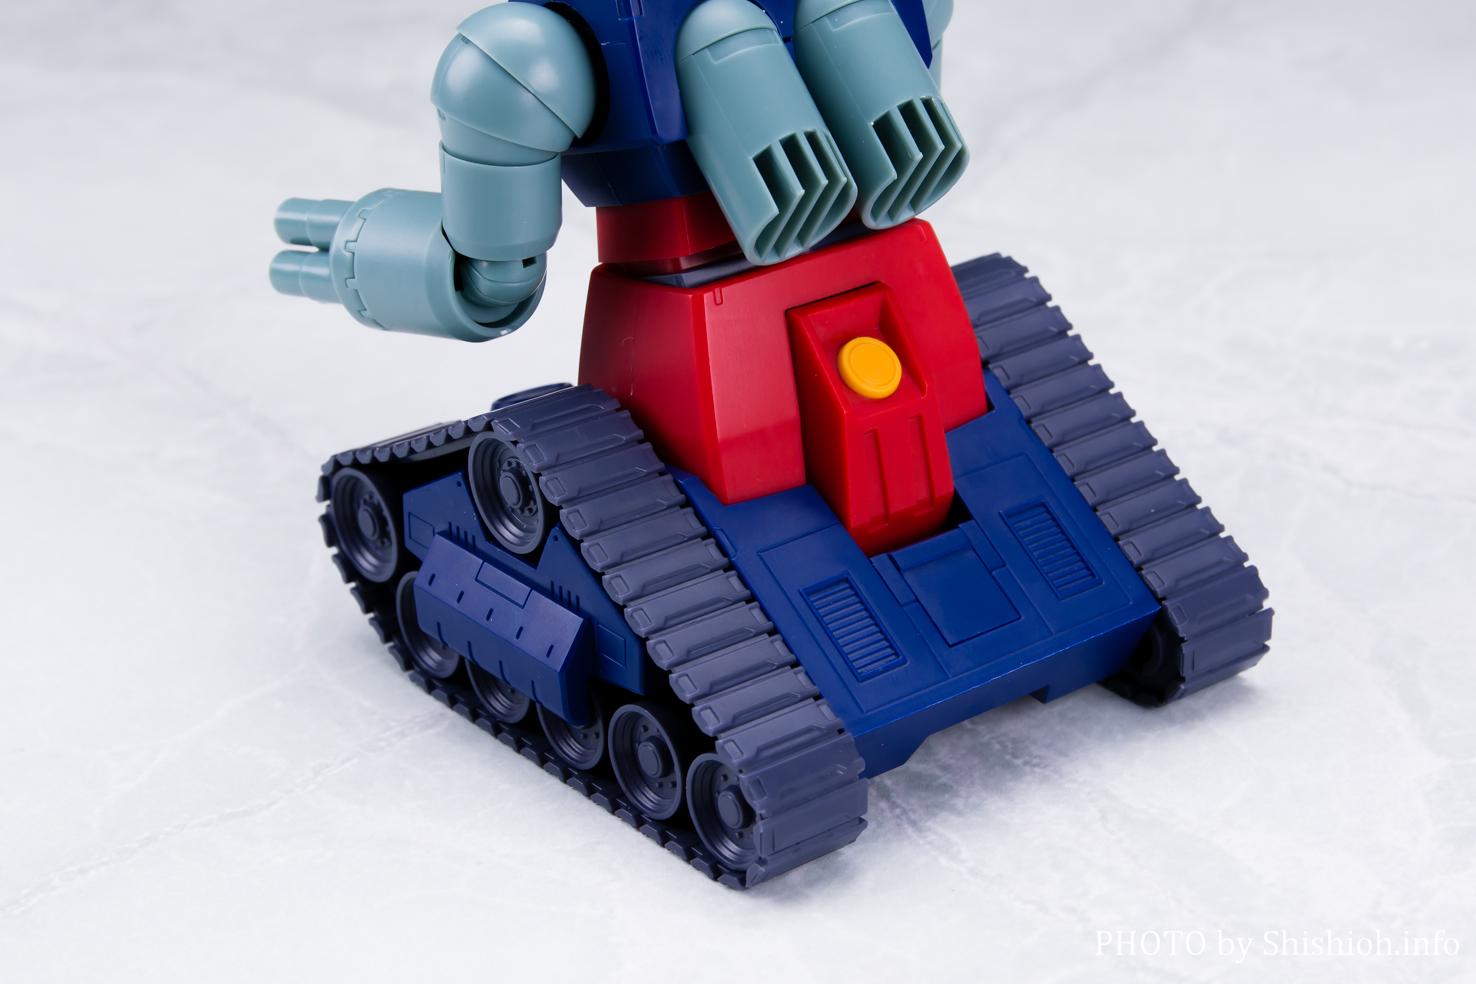 ROBOT魂〈SIDE MS〉RX-75-4 ガンタンク&ホワイトベースデッキ ver.A.N.I.M.E.